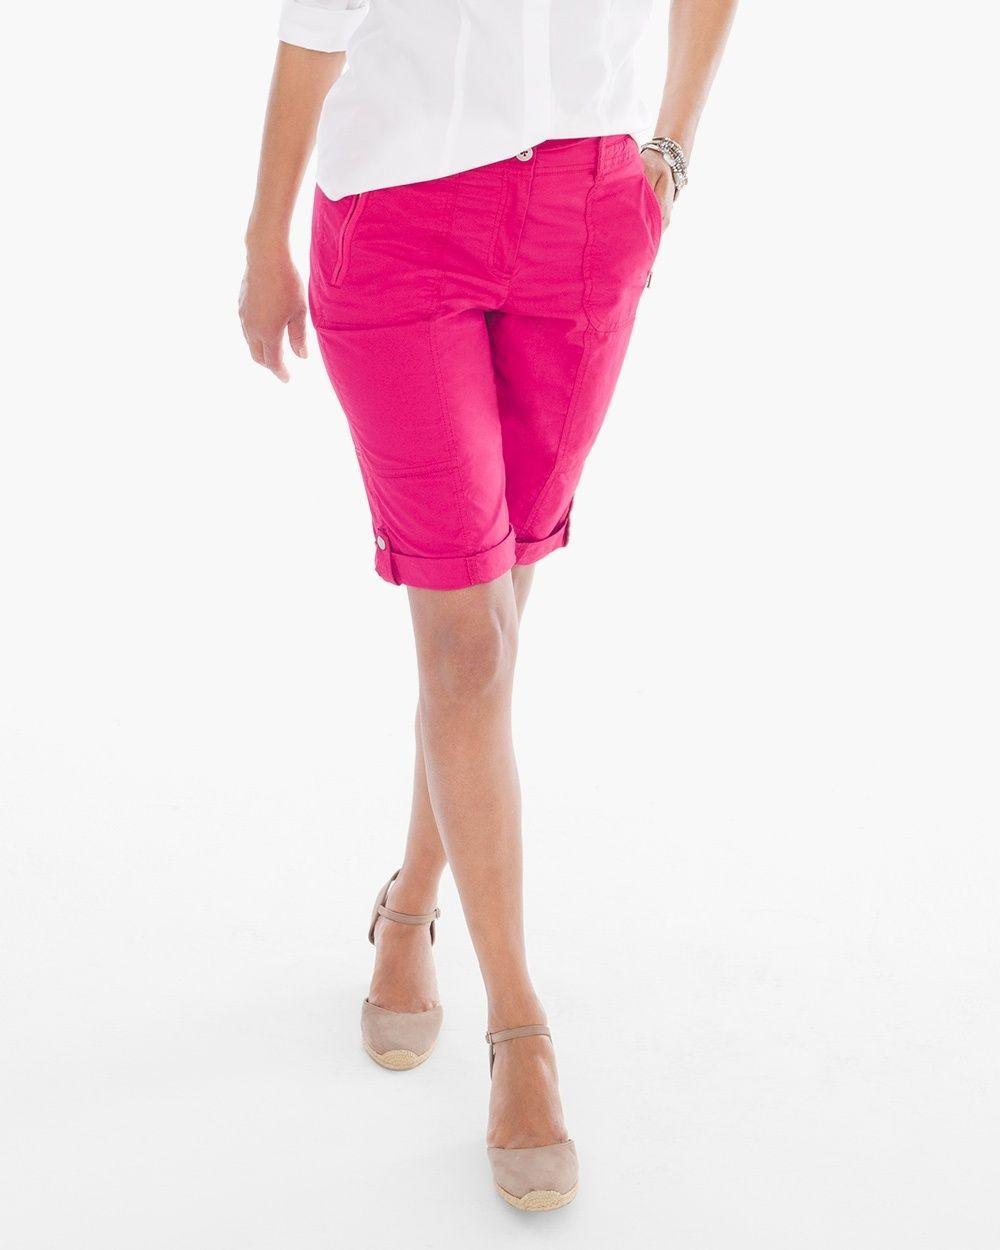 Chico's Women's Casual Roll-Cuff Shorts